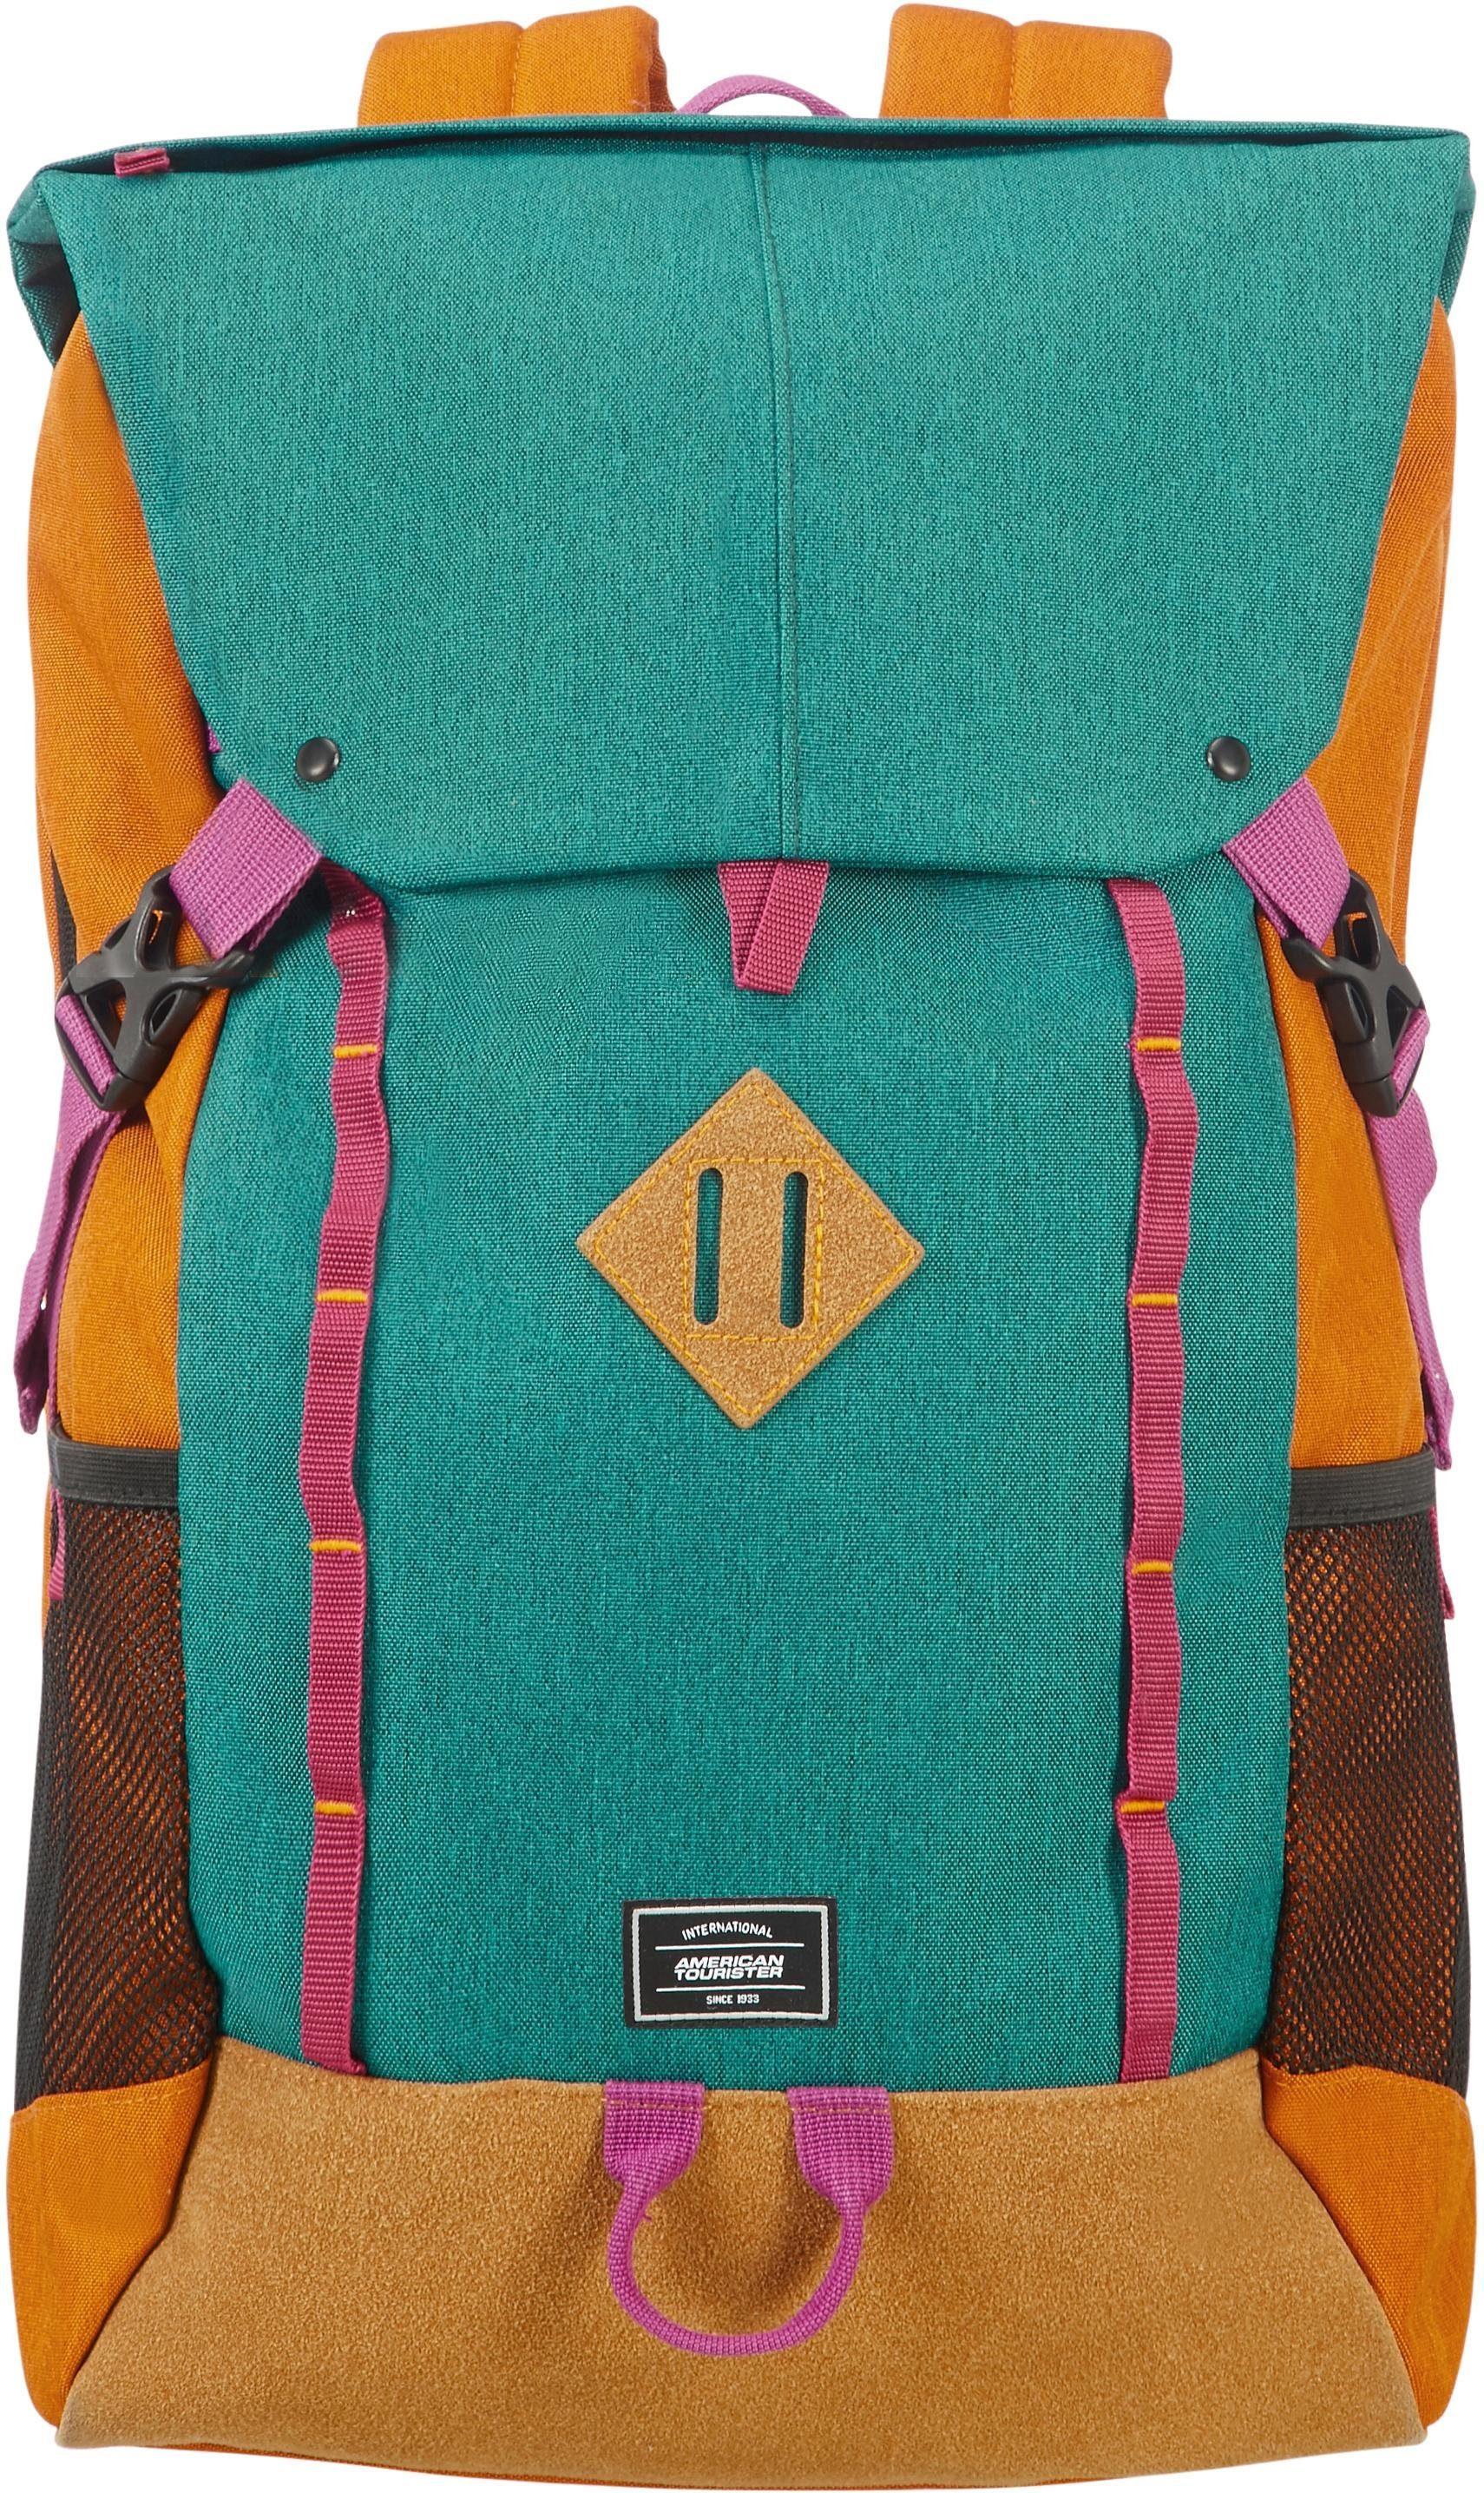 American Tourister Rucksack mit Laptopfach, »Urban Groove UG5 17.3 Zoll, Green/Orange«